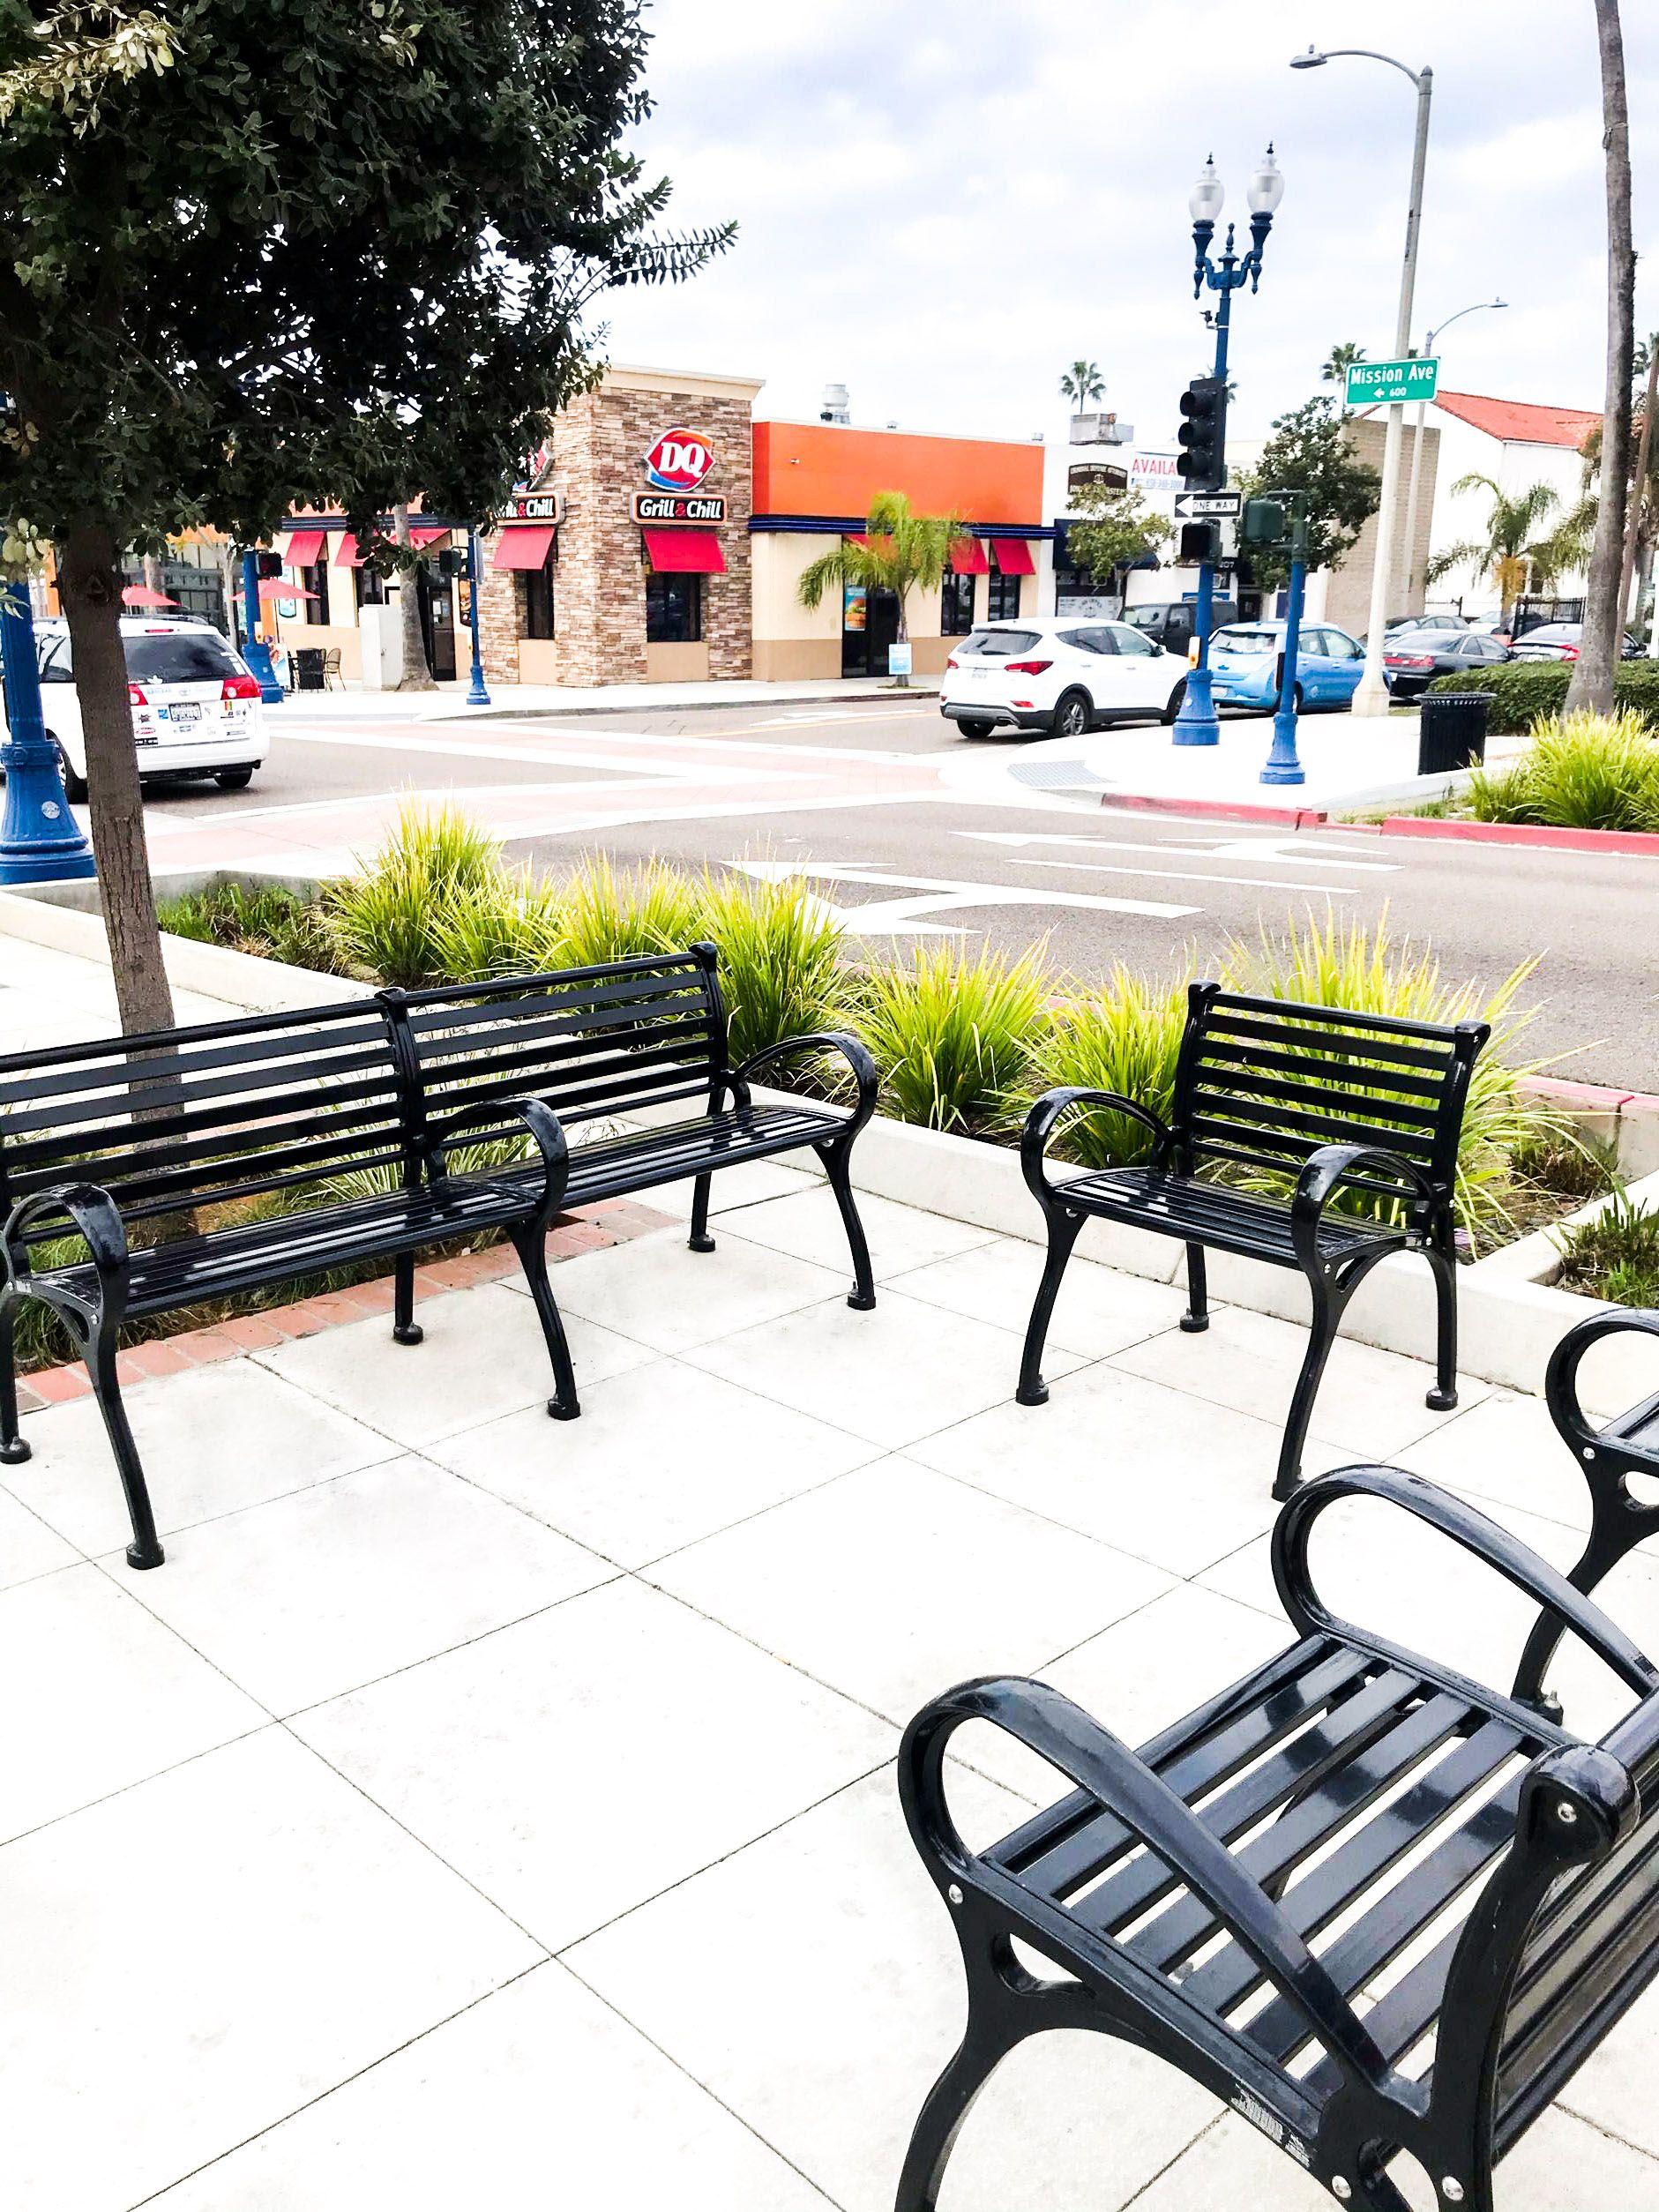 California Streetscape In 2020 Streetscape Design Design Bench With Back